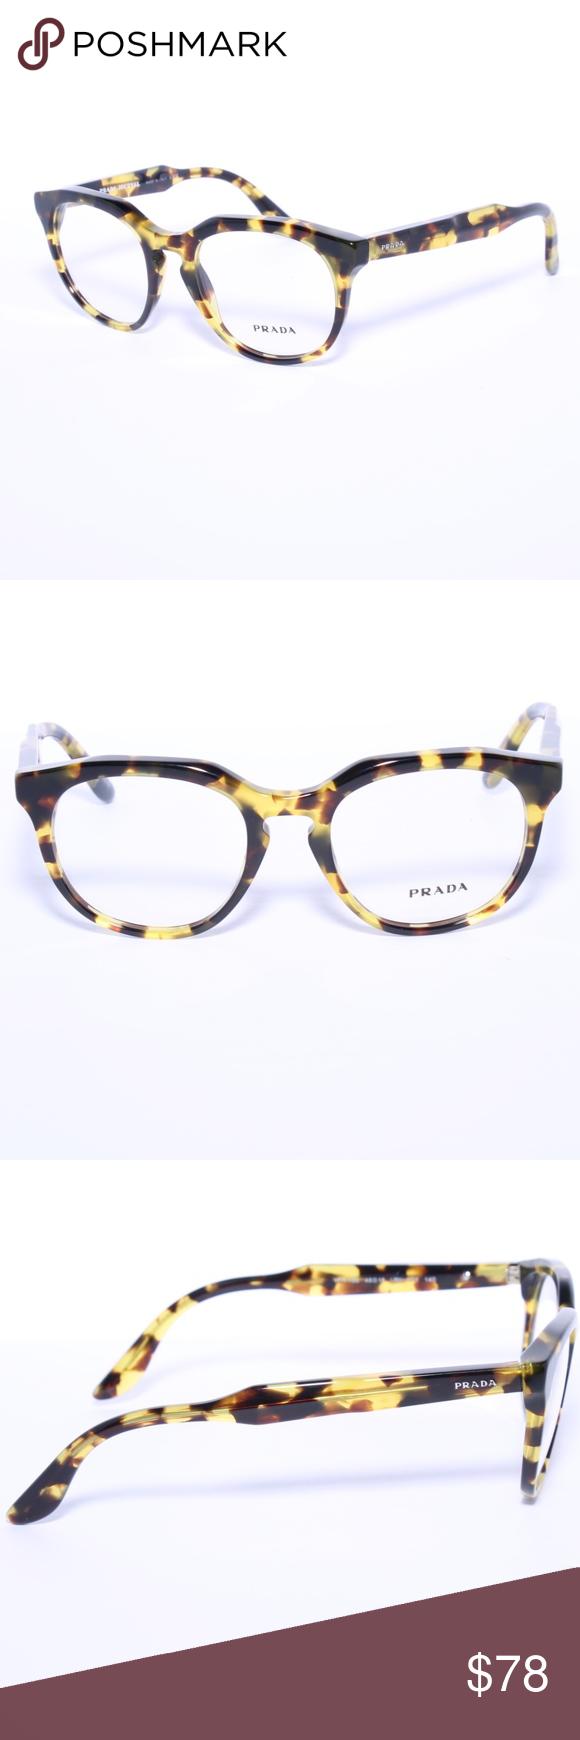 34d69923056 Prada VPR13S Eyeglasses Apple Green Havana Prada VPR13S Eyeglasses Frames  Apple Green Havana UBN-1O1 48mm Brand new 100% authentic Comes with Generic  Case